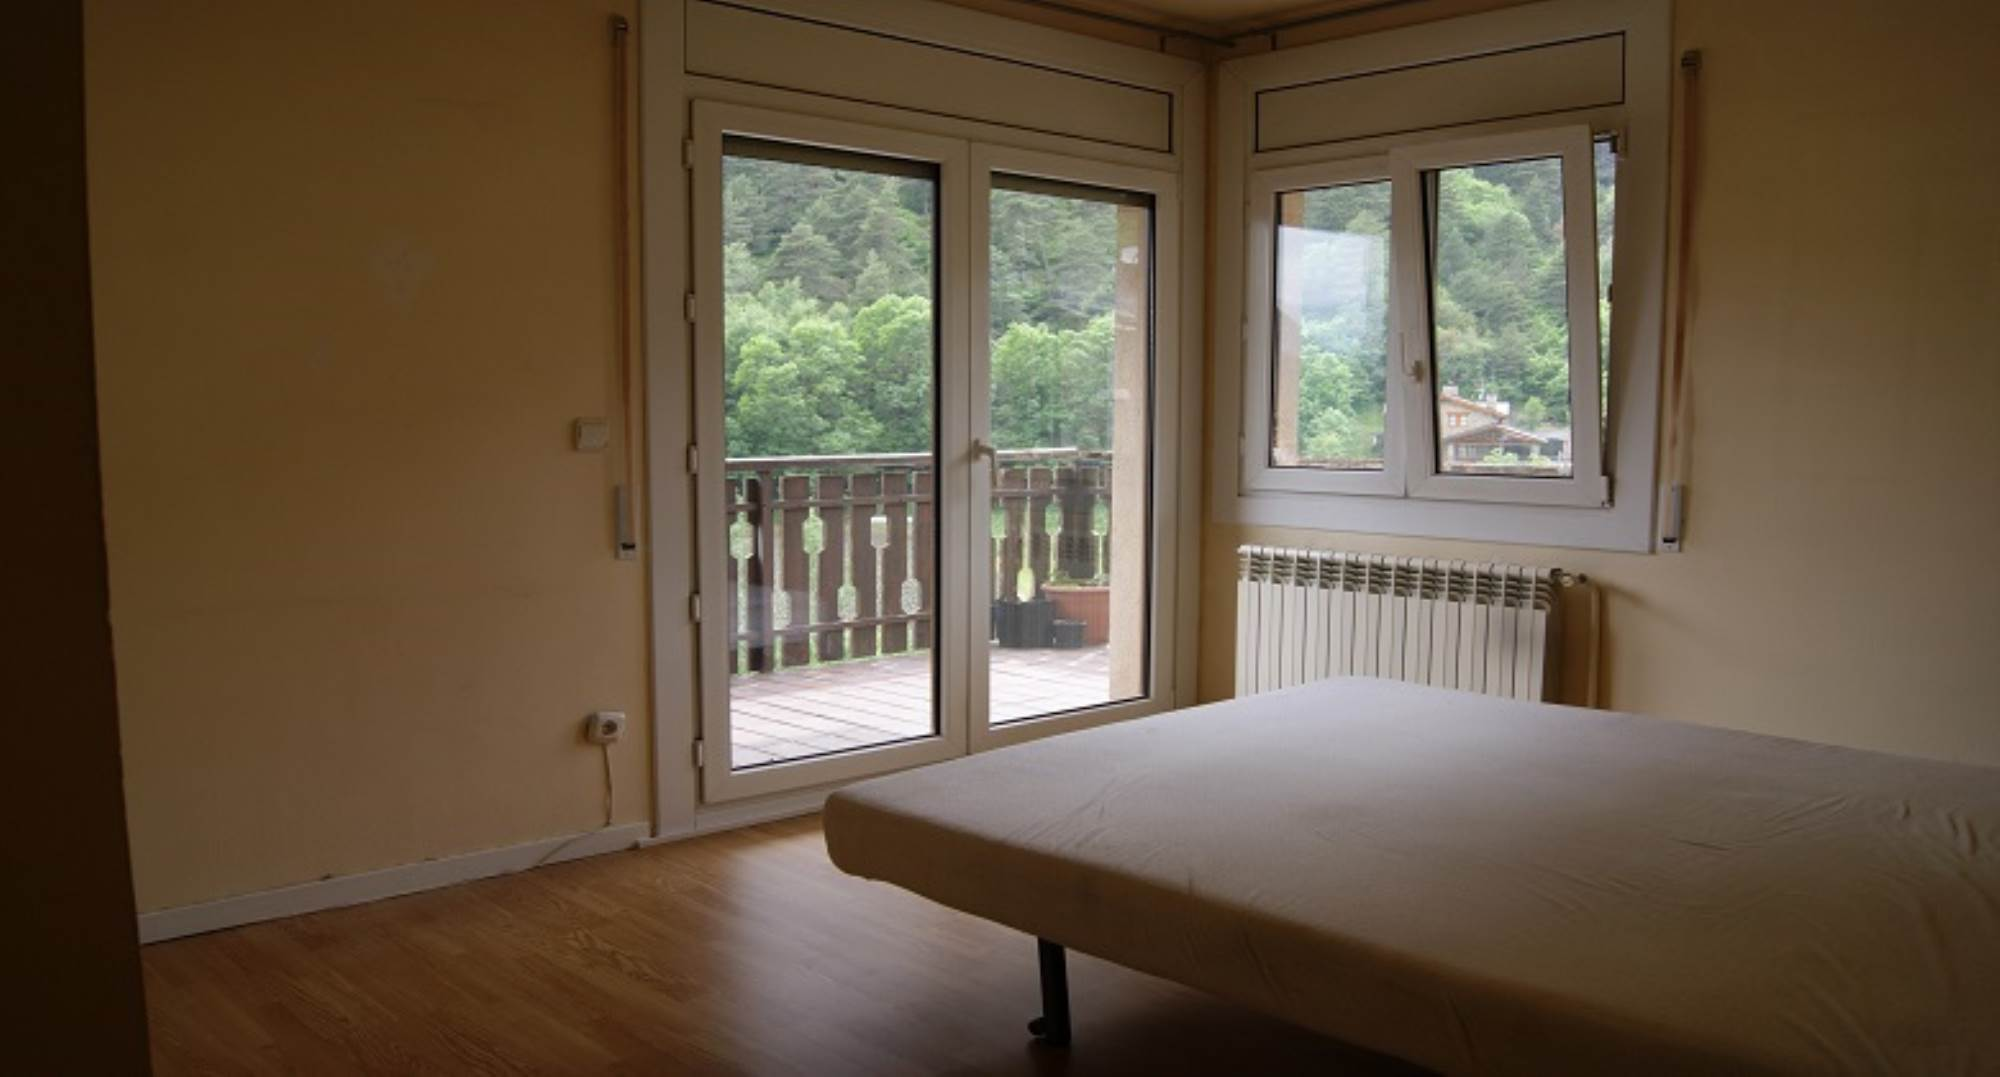 3 dormitoris doble